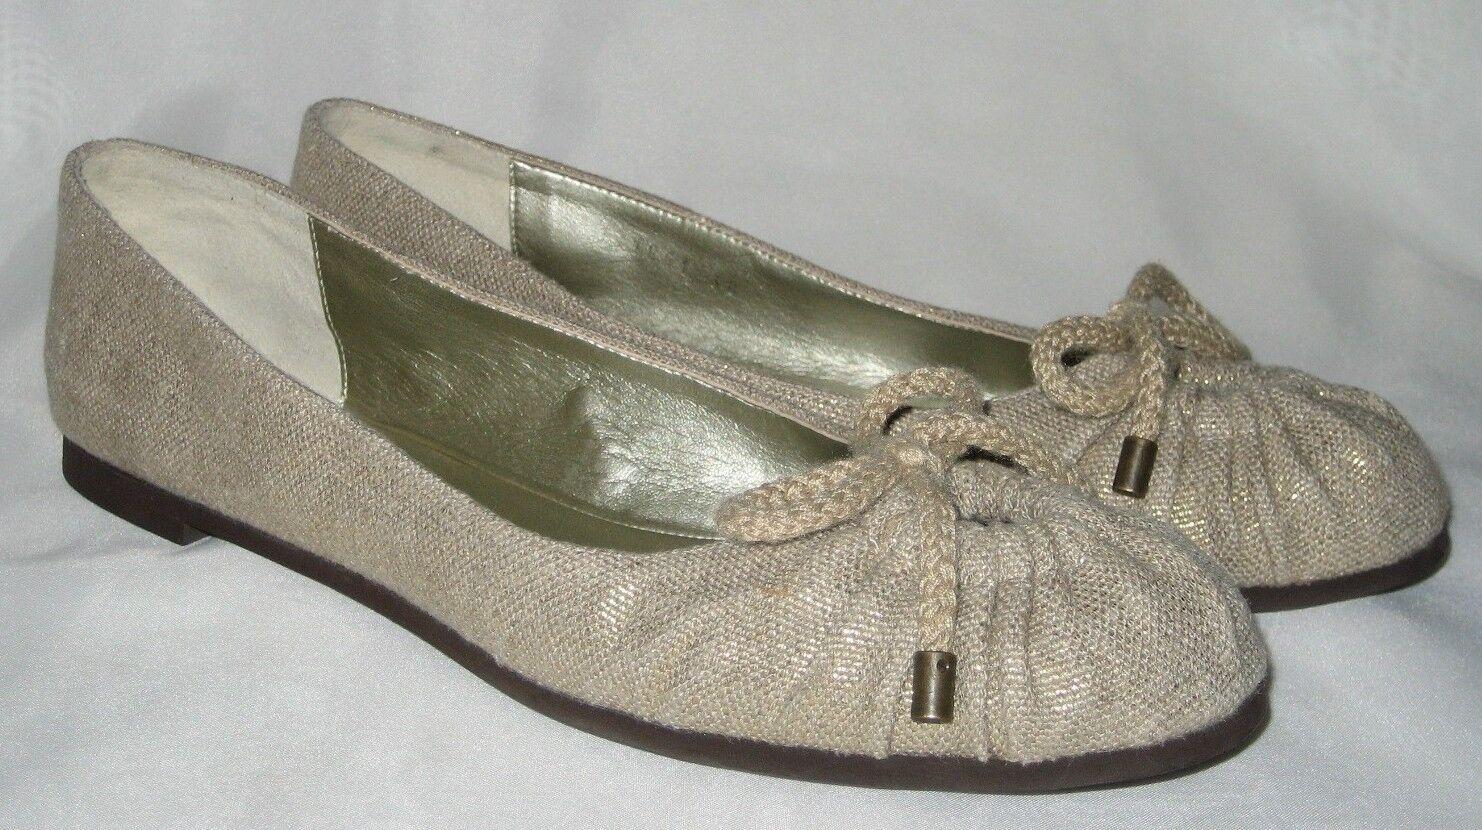 STELLA McCARTNEY Linen w/ Gold Ballet Flats EUR 7.5 US / 38 EUR Flats  Mint Condition c42731